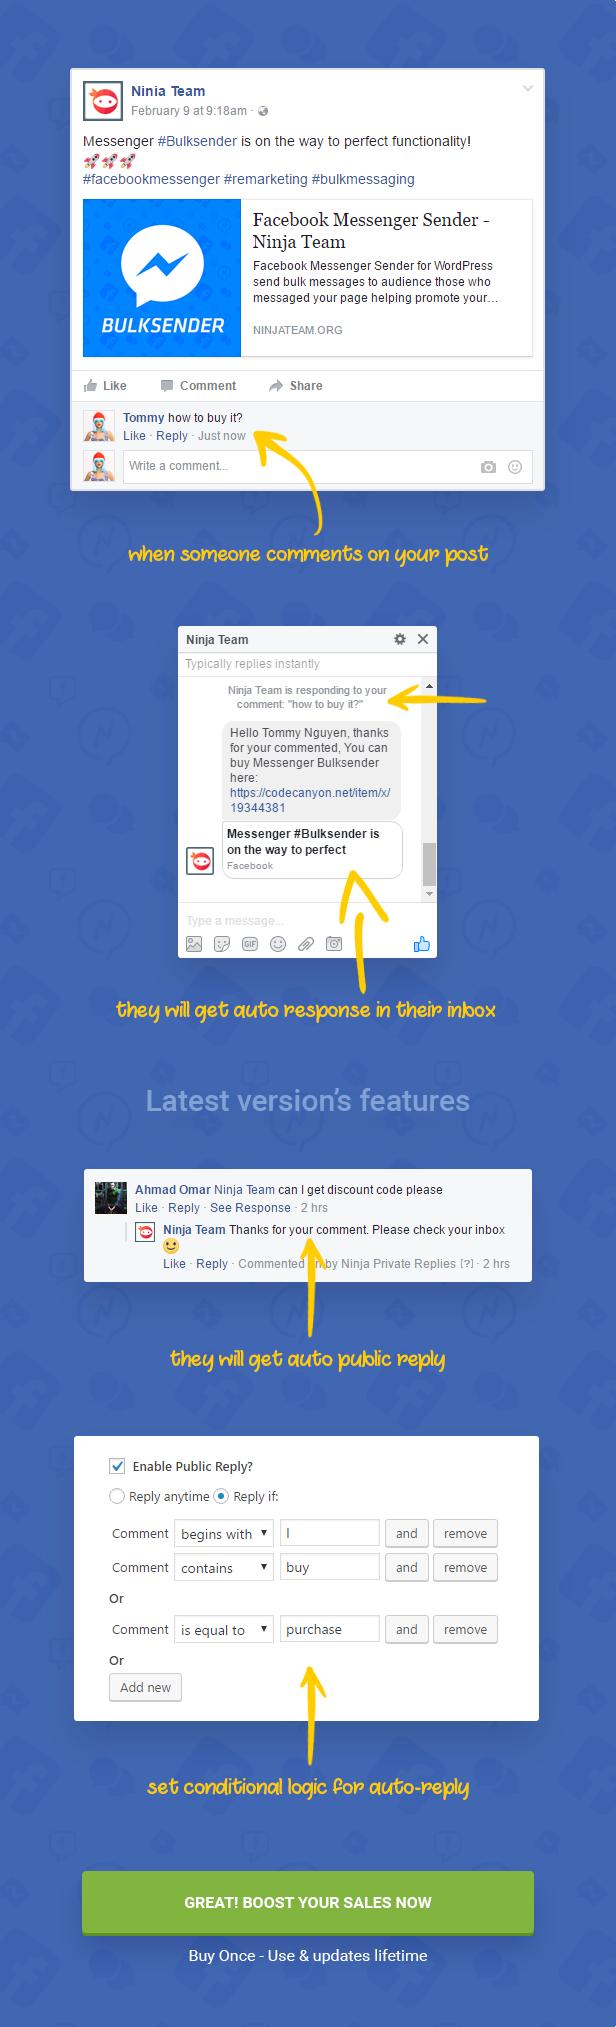 Facebook Messenger Auto-Reply 2